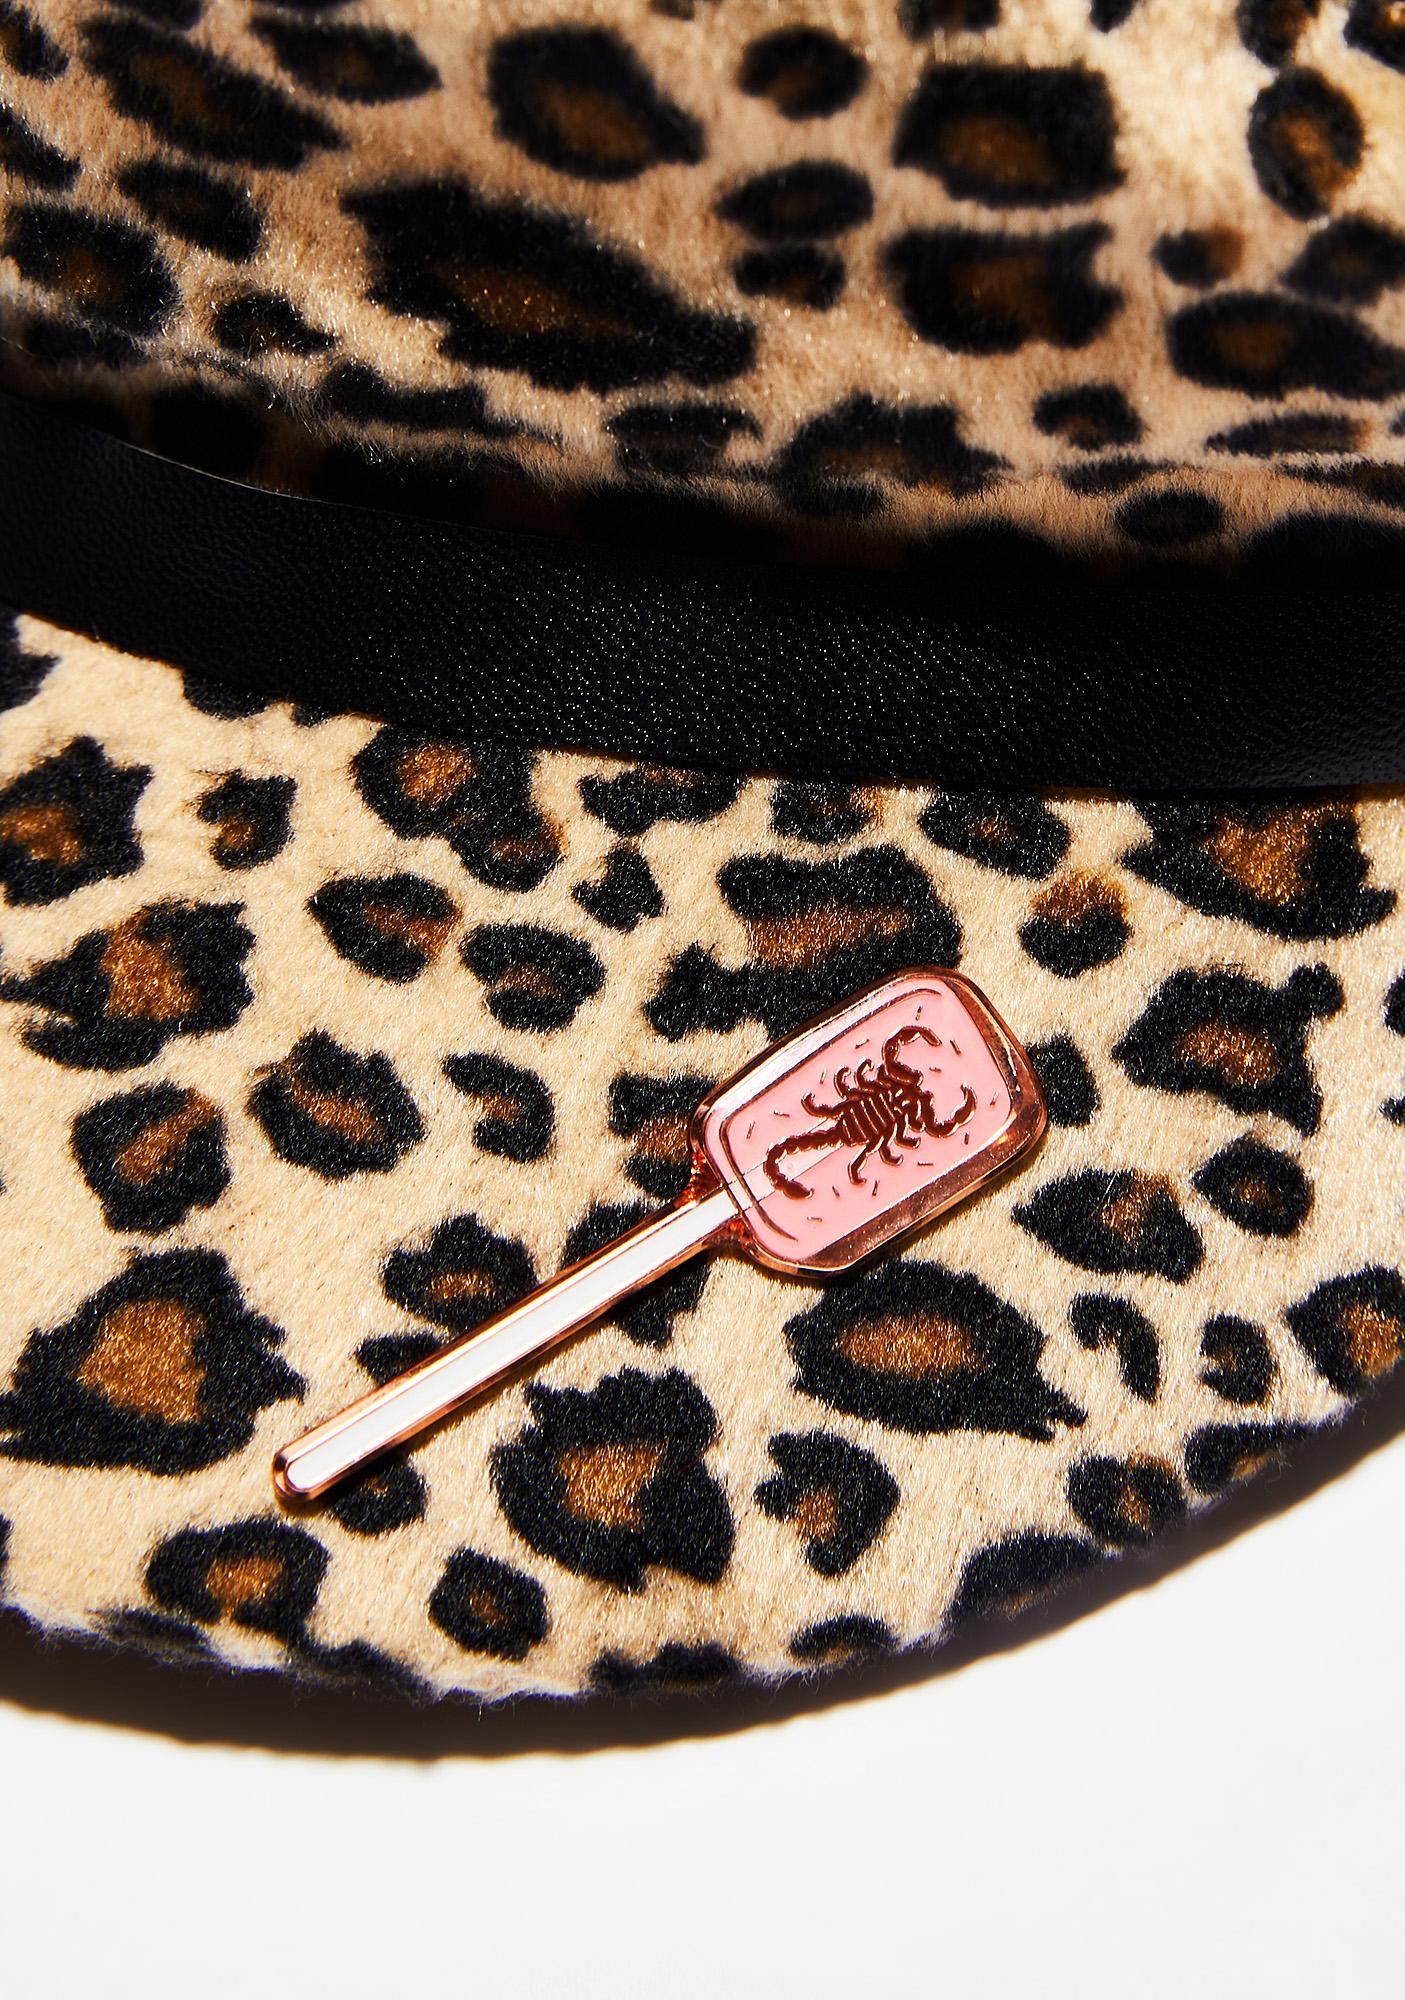 Rosehound Apparel Scorpion Sucker Lapel Pin